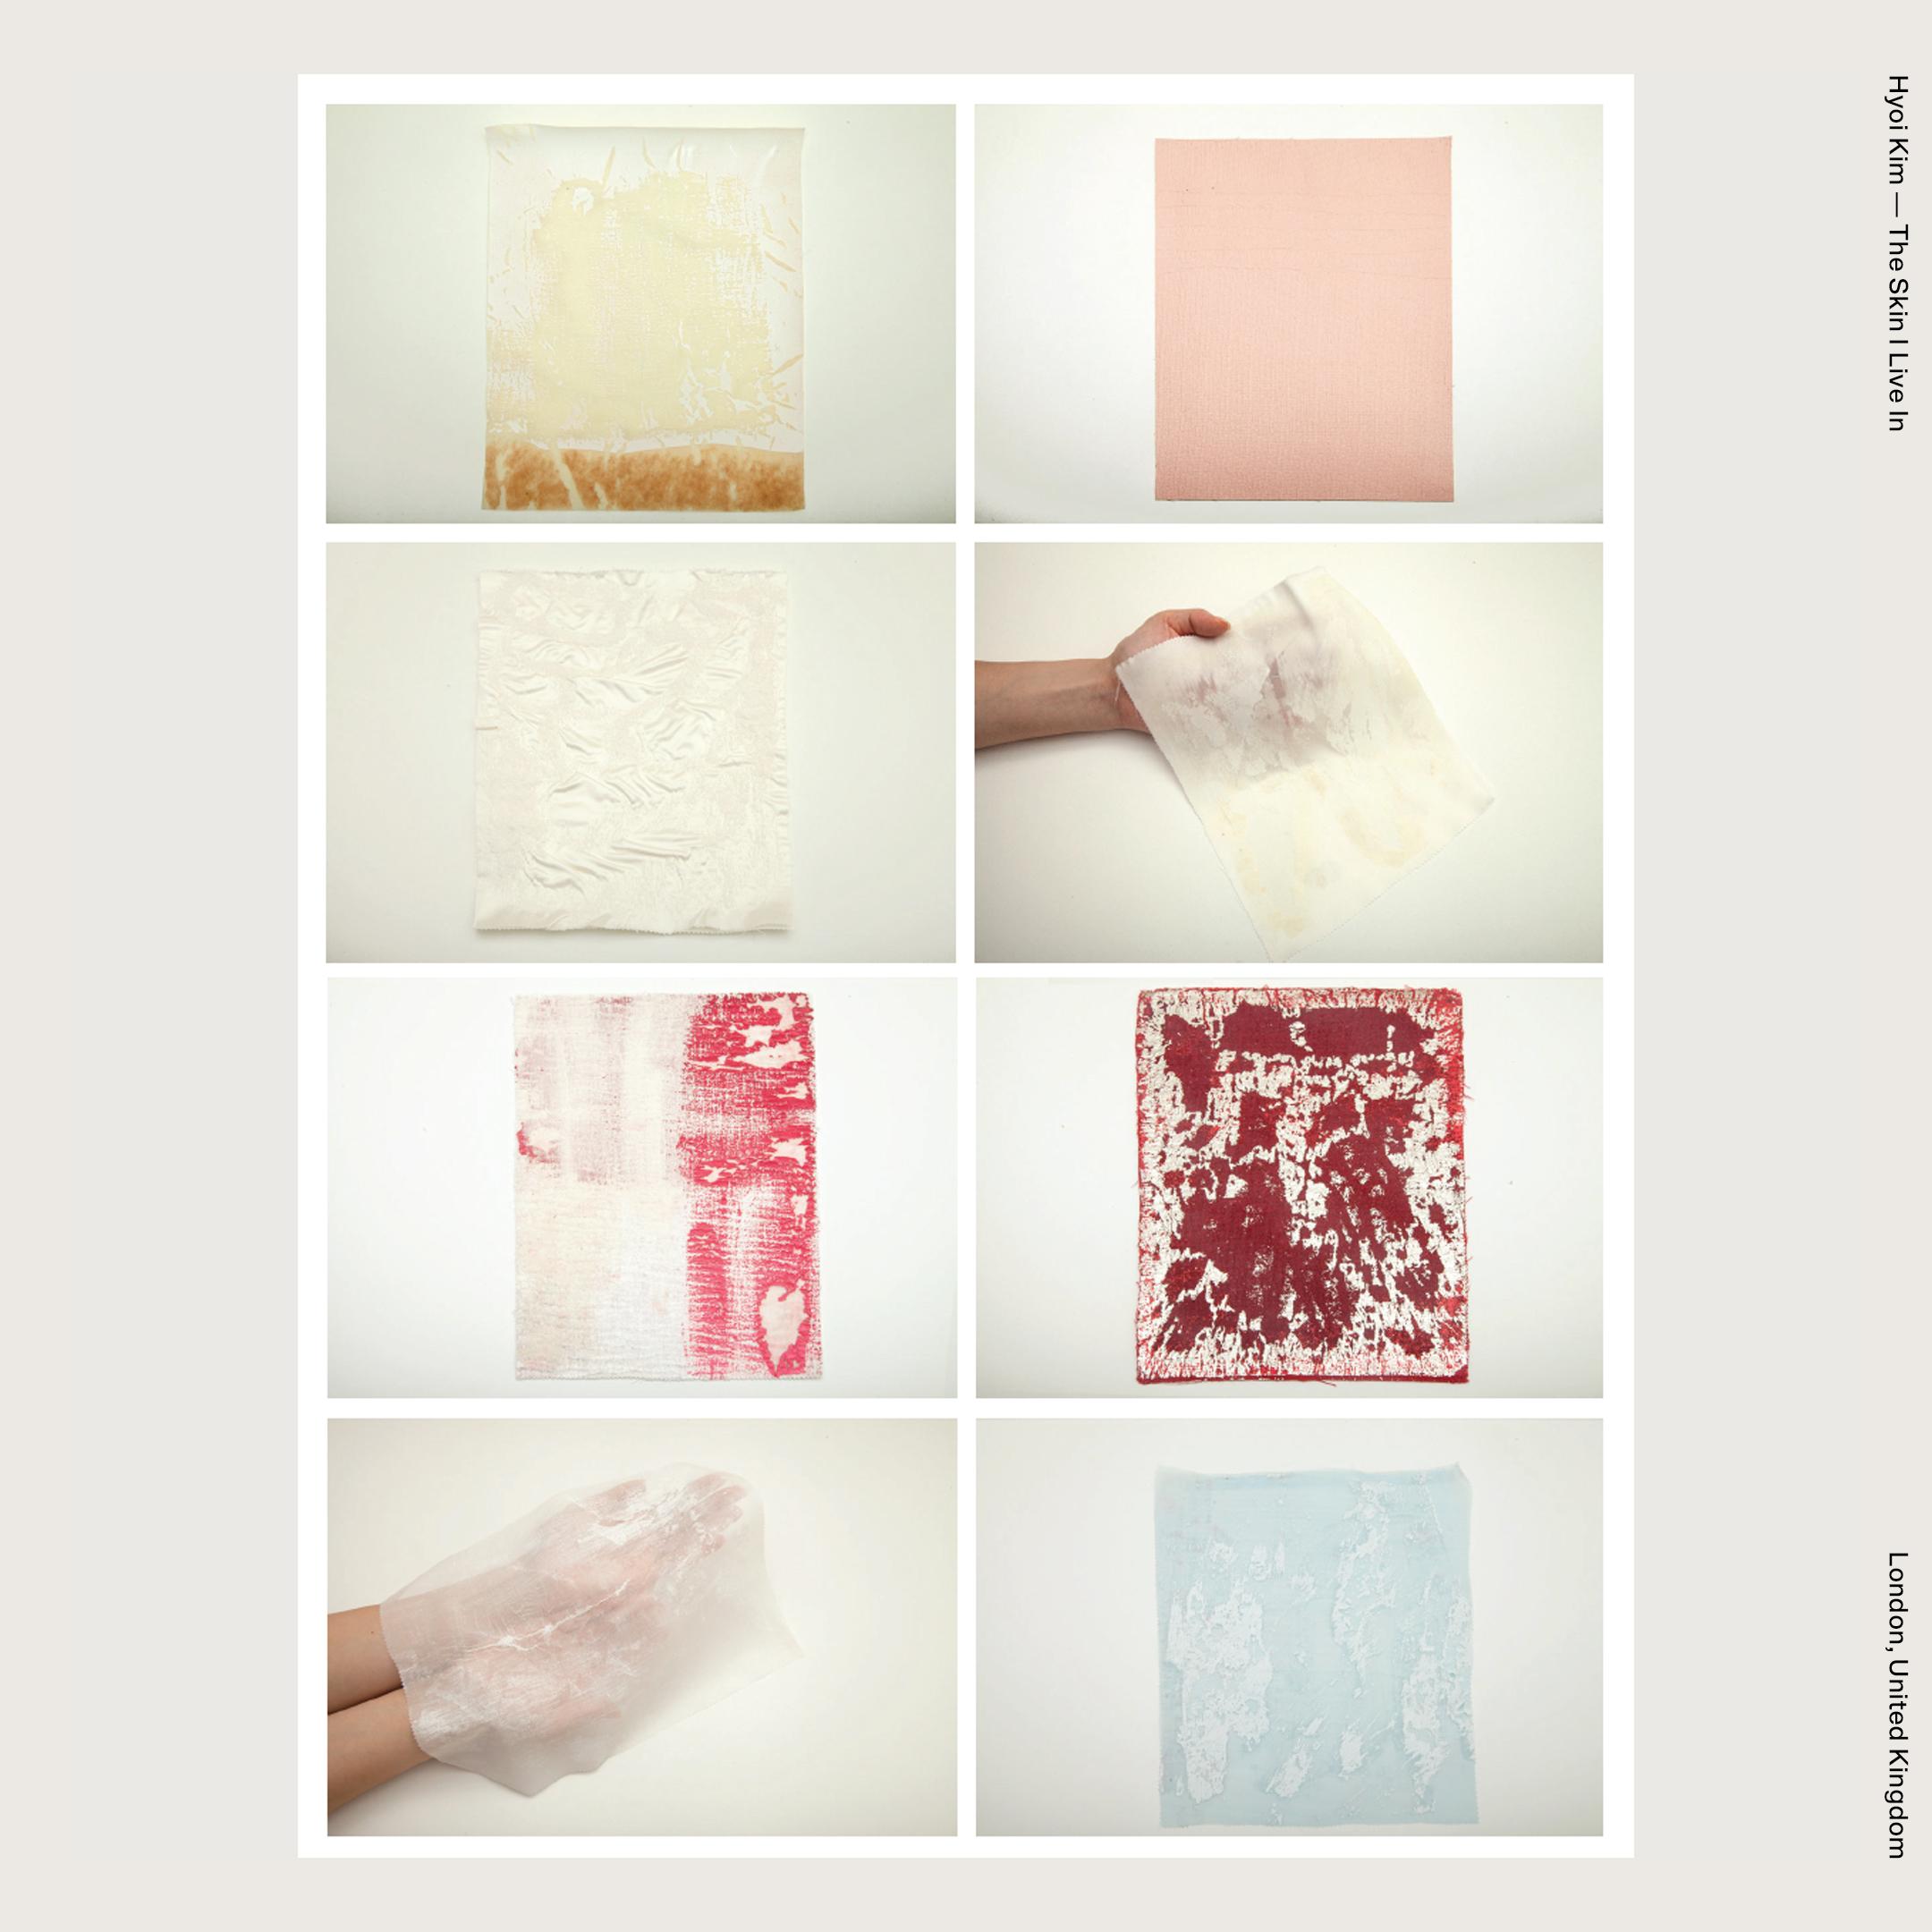 Hyoi Kim — The Skin I Live In